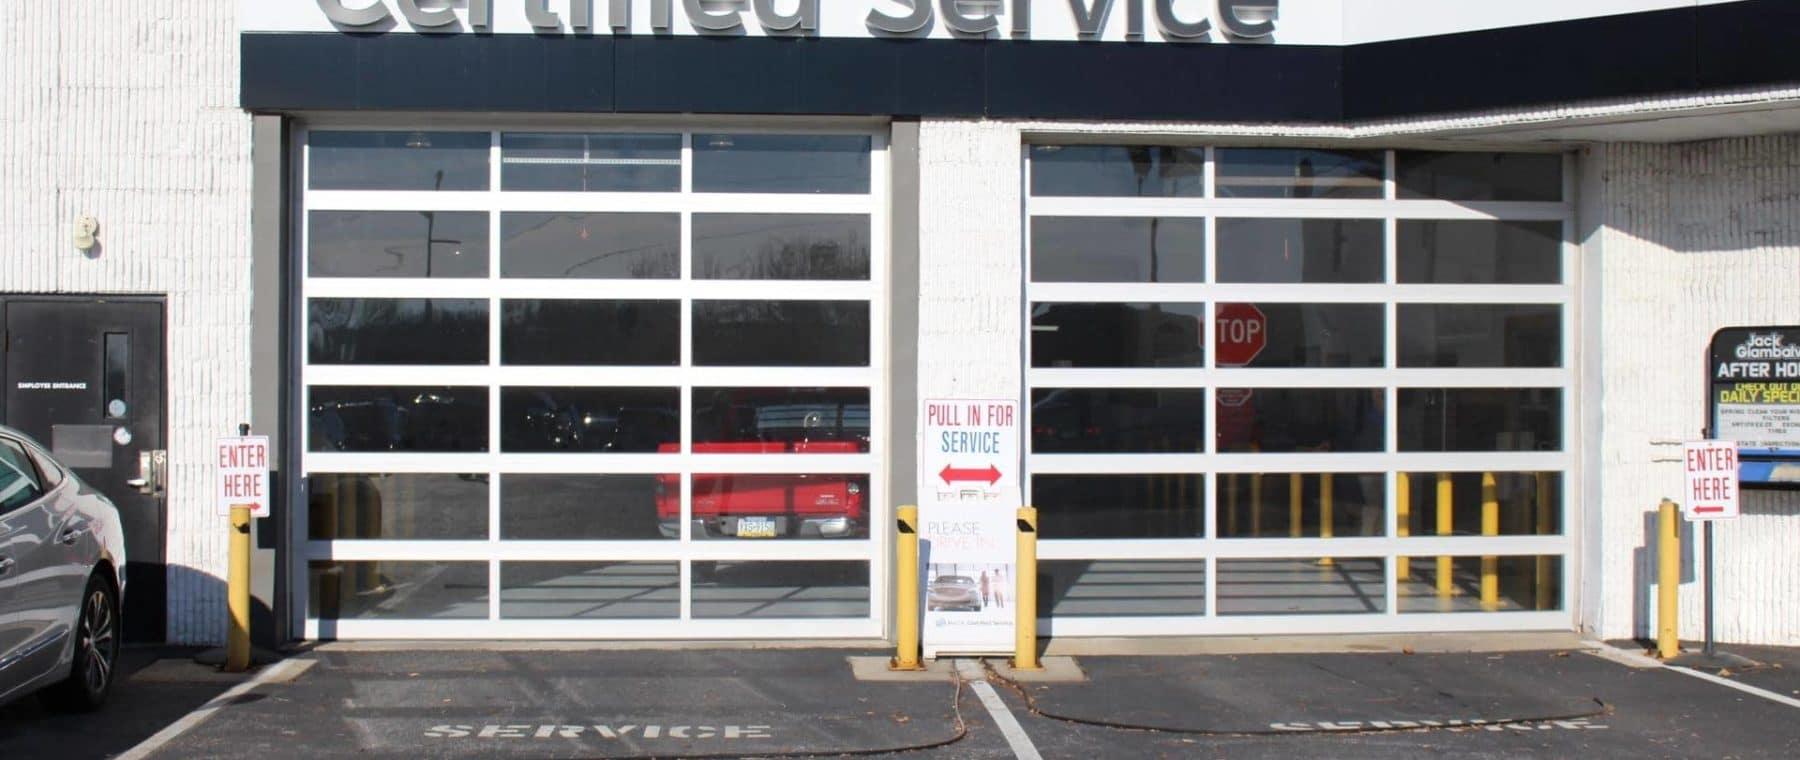 certified service entrance